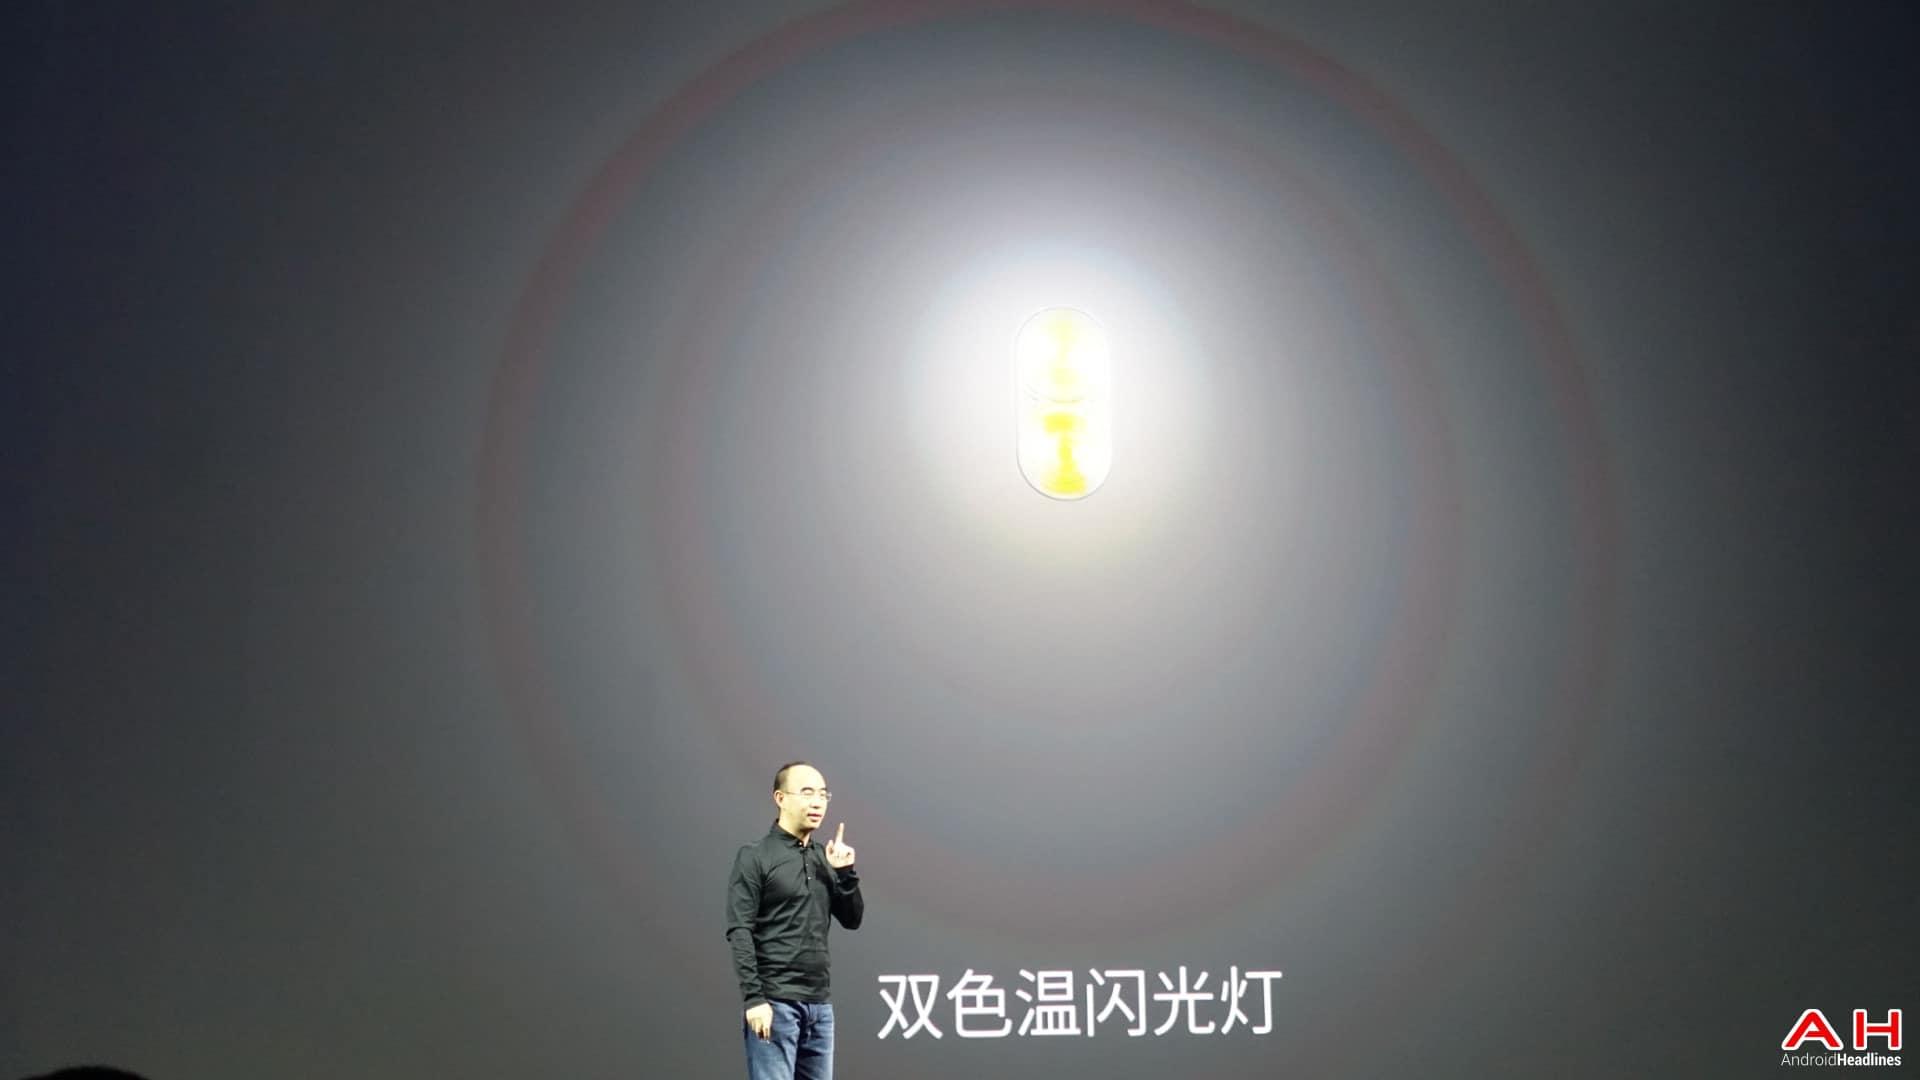 AH Meizu Blue Charm Note event 19